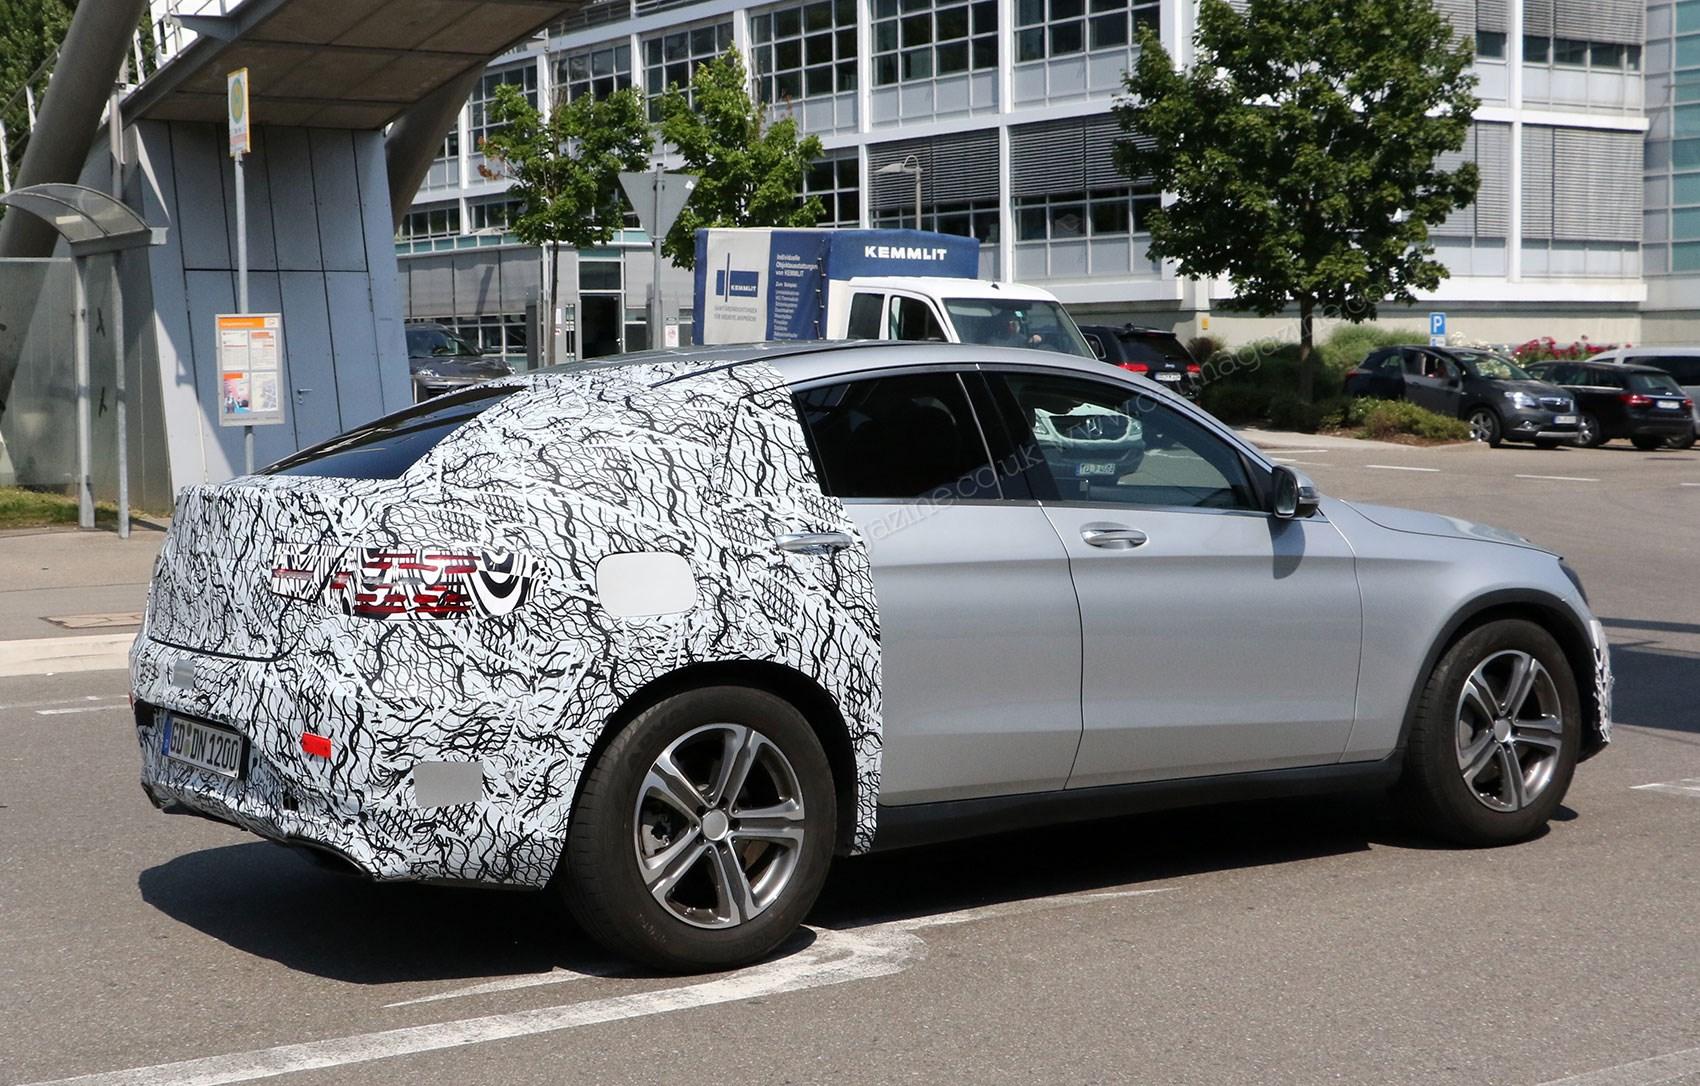 Mercedes Vs Bmw Who Breaks Down More